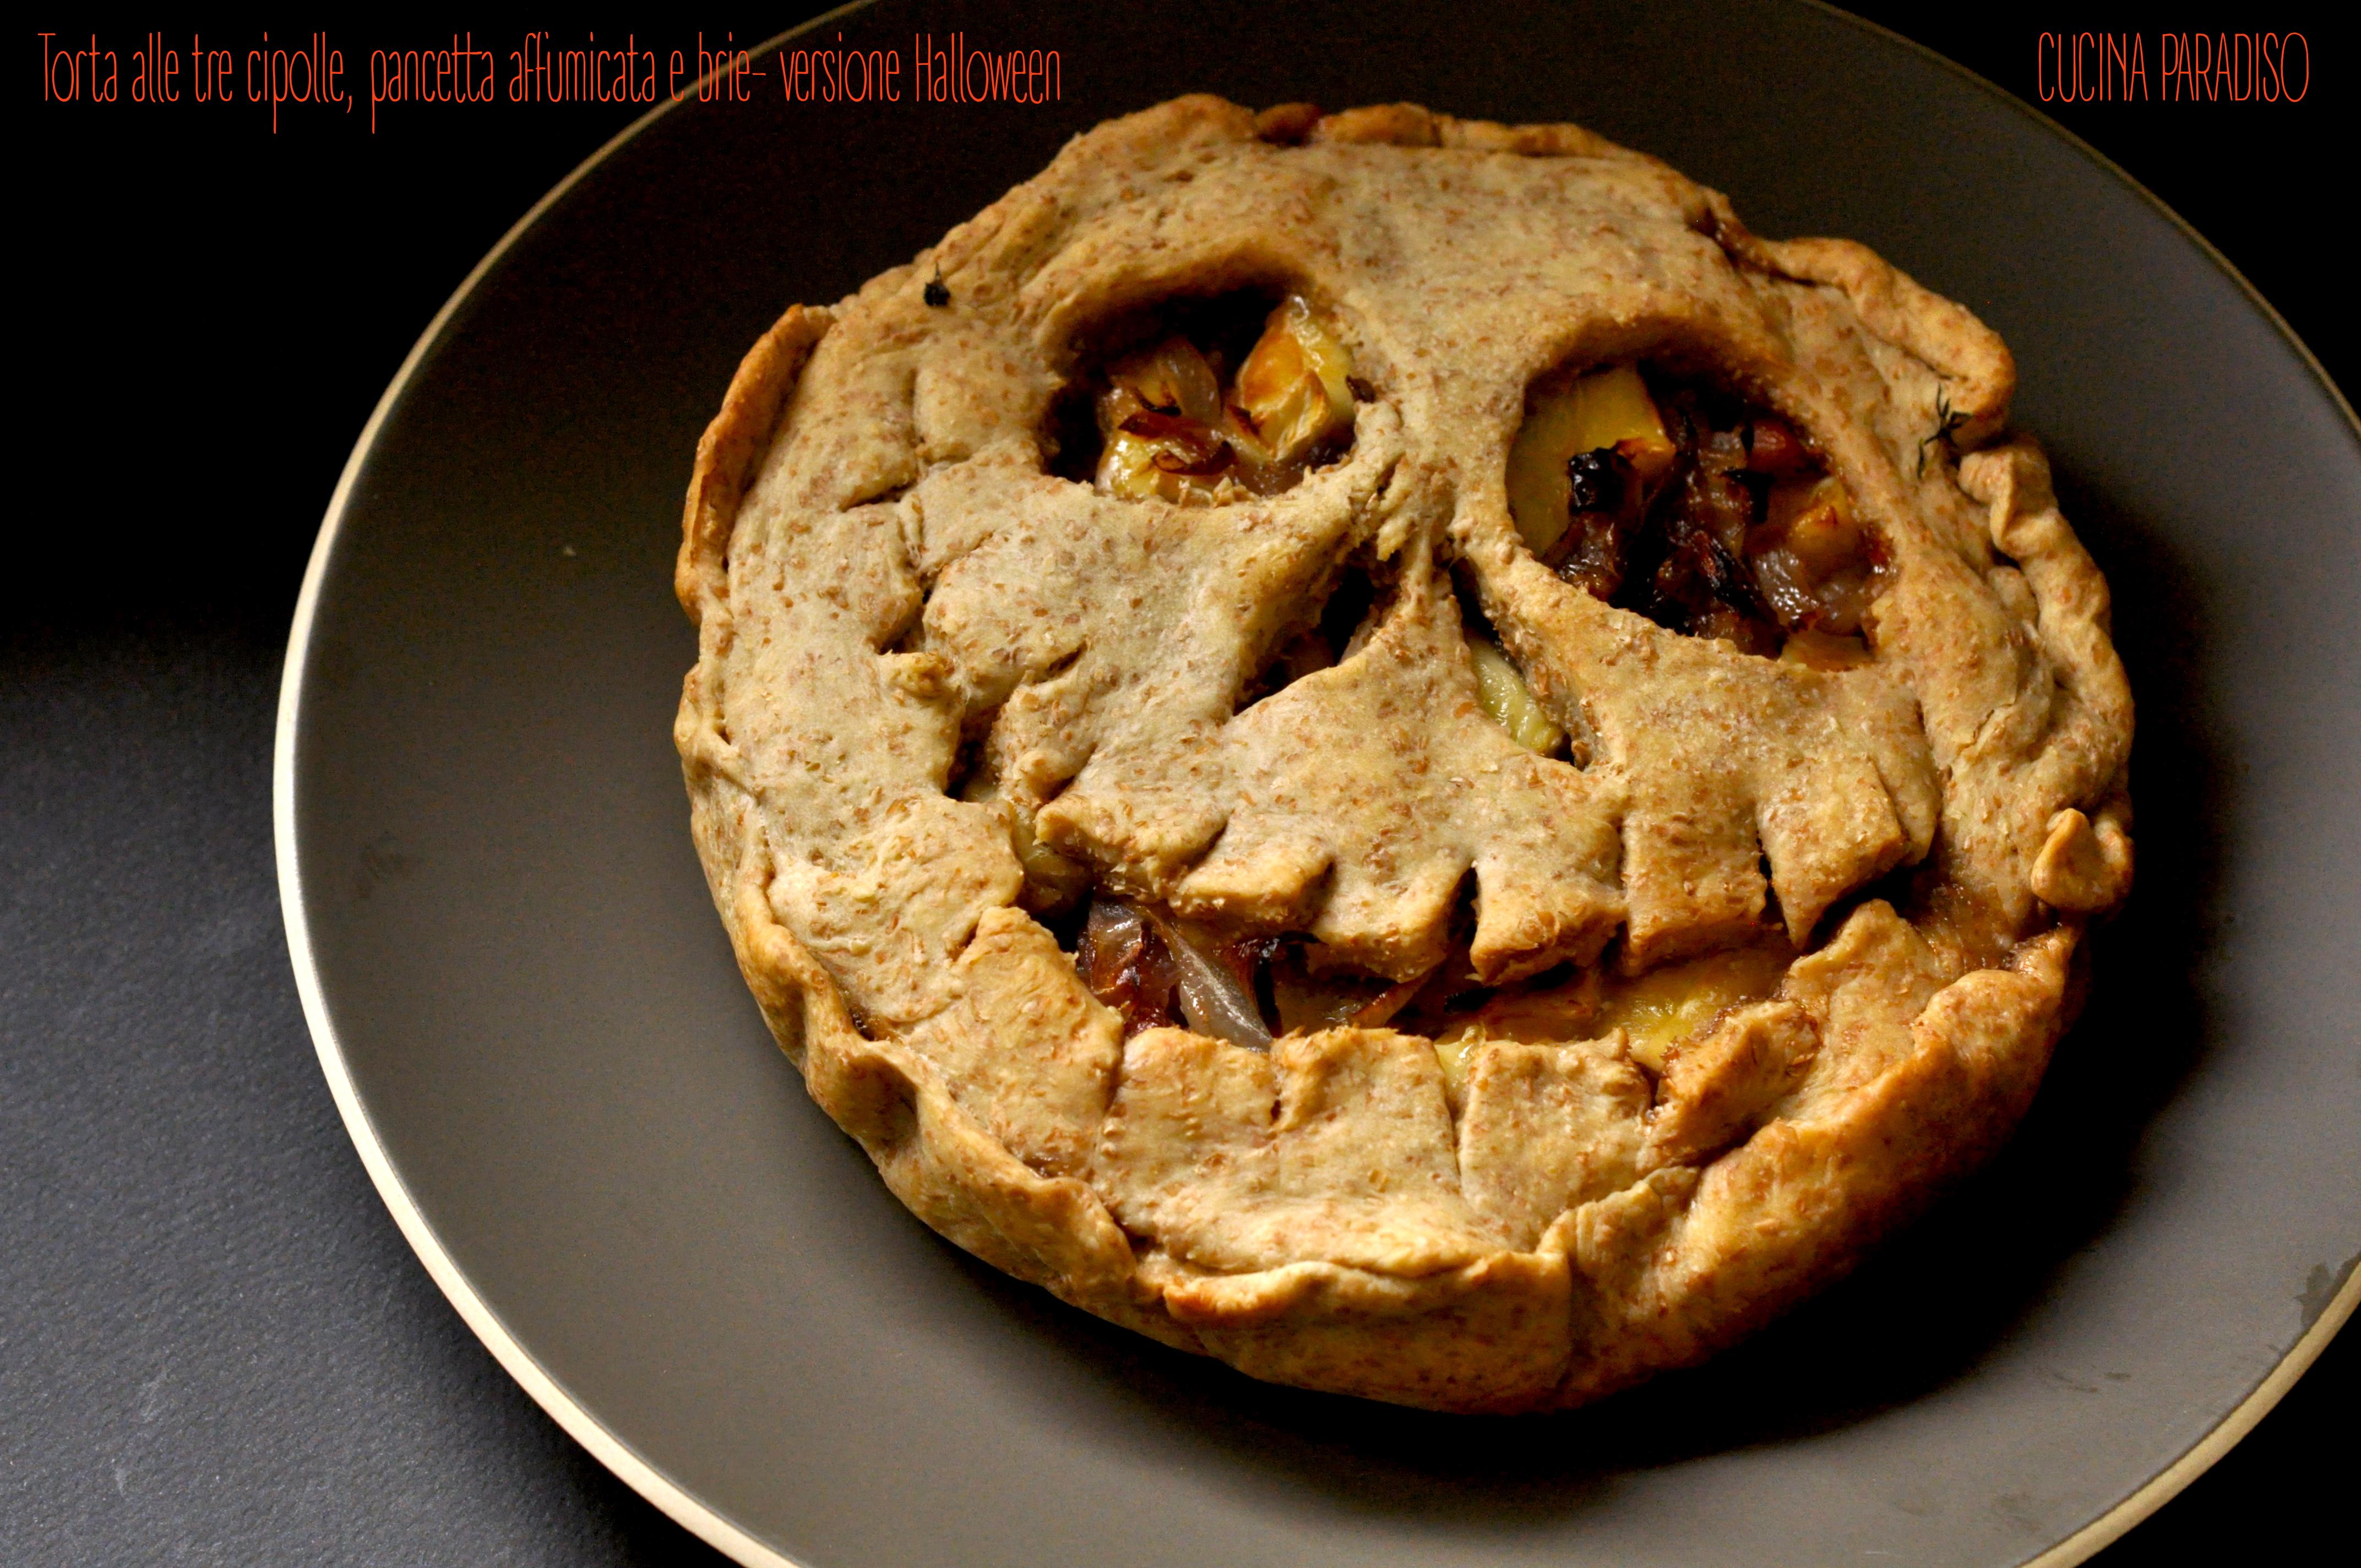 torta-alle-tre-cipolle-pancetta-affumicata-e-brie-versione-halloween3